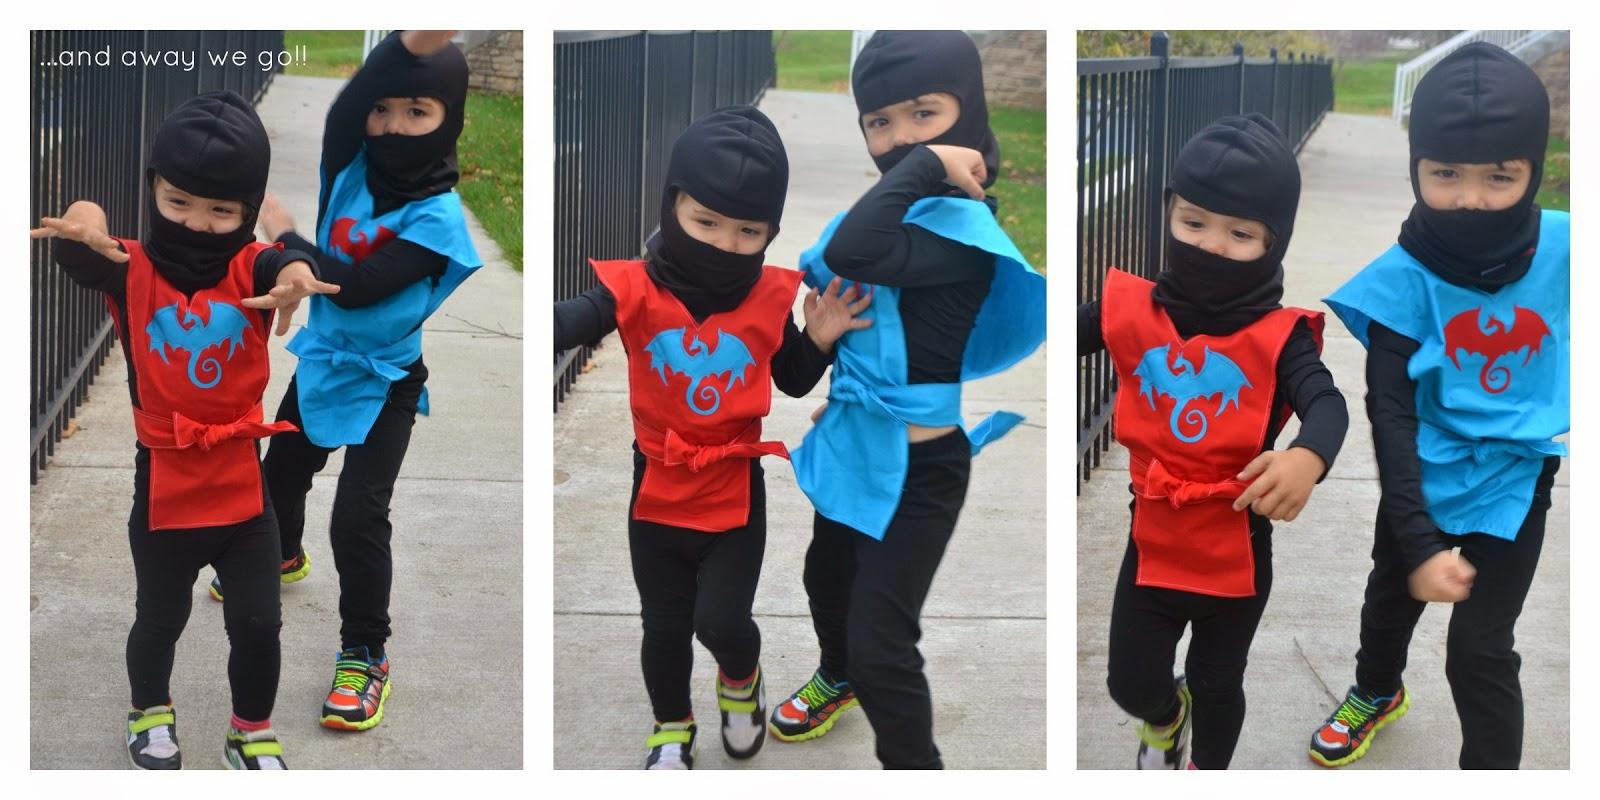 Diy girl ninja costume the random pictures thread only rule post diy ninja costumes solutioingenieria Image collections